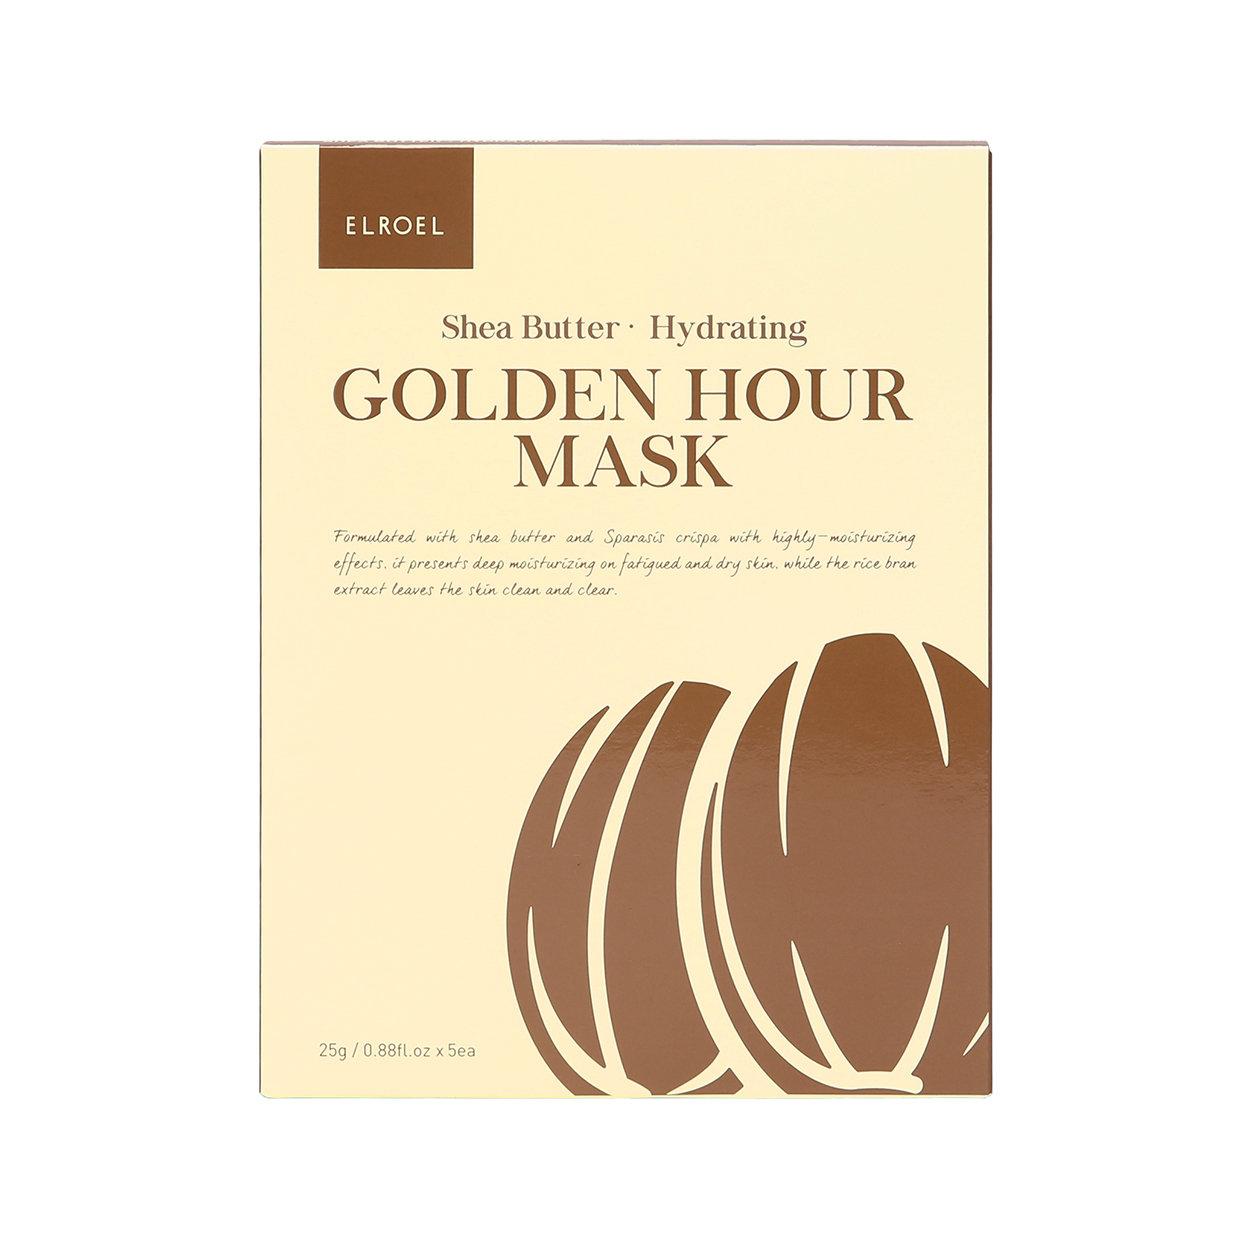 Image of 5 Maschere Monouso Golden Hour - Shea Butter